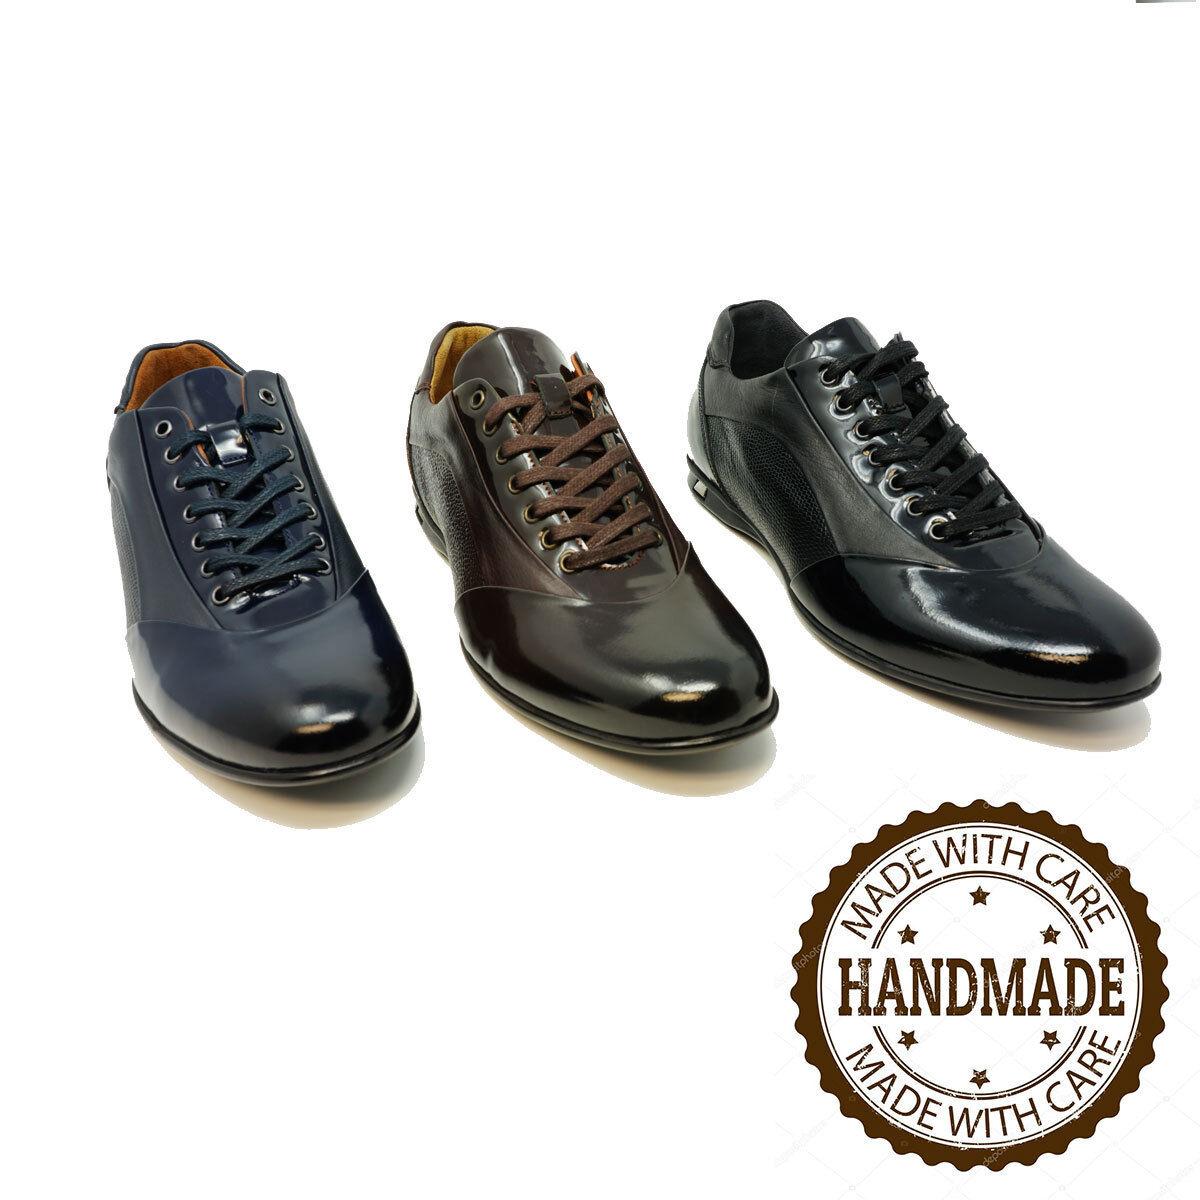 Futoli - Fashion Sneaker Genuine Leather Handcrafted